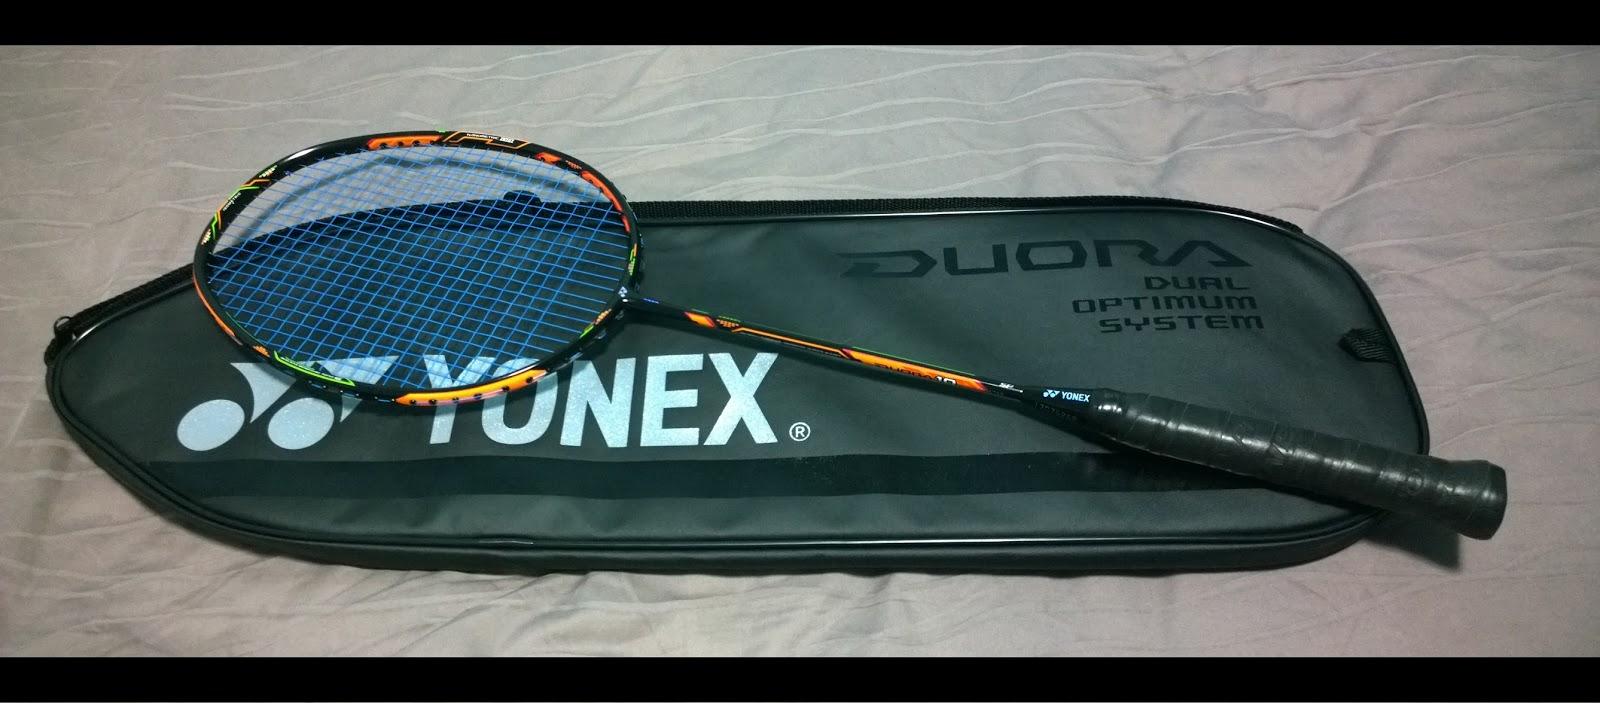 Of badminton things: Badminton Racket New Launch: Yonex ...